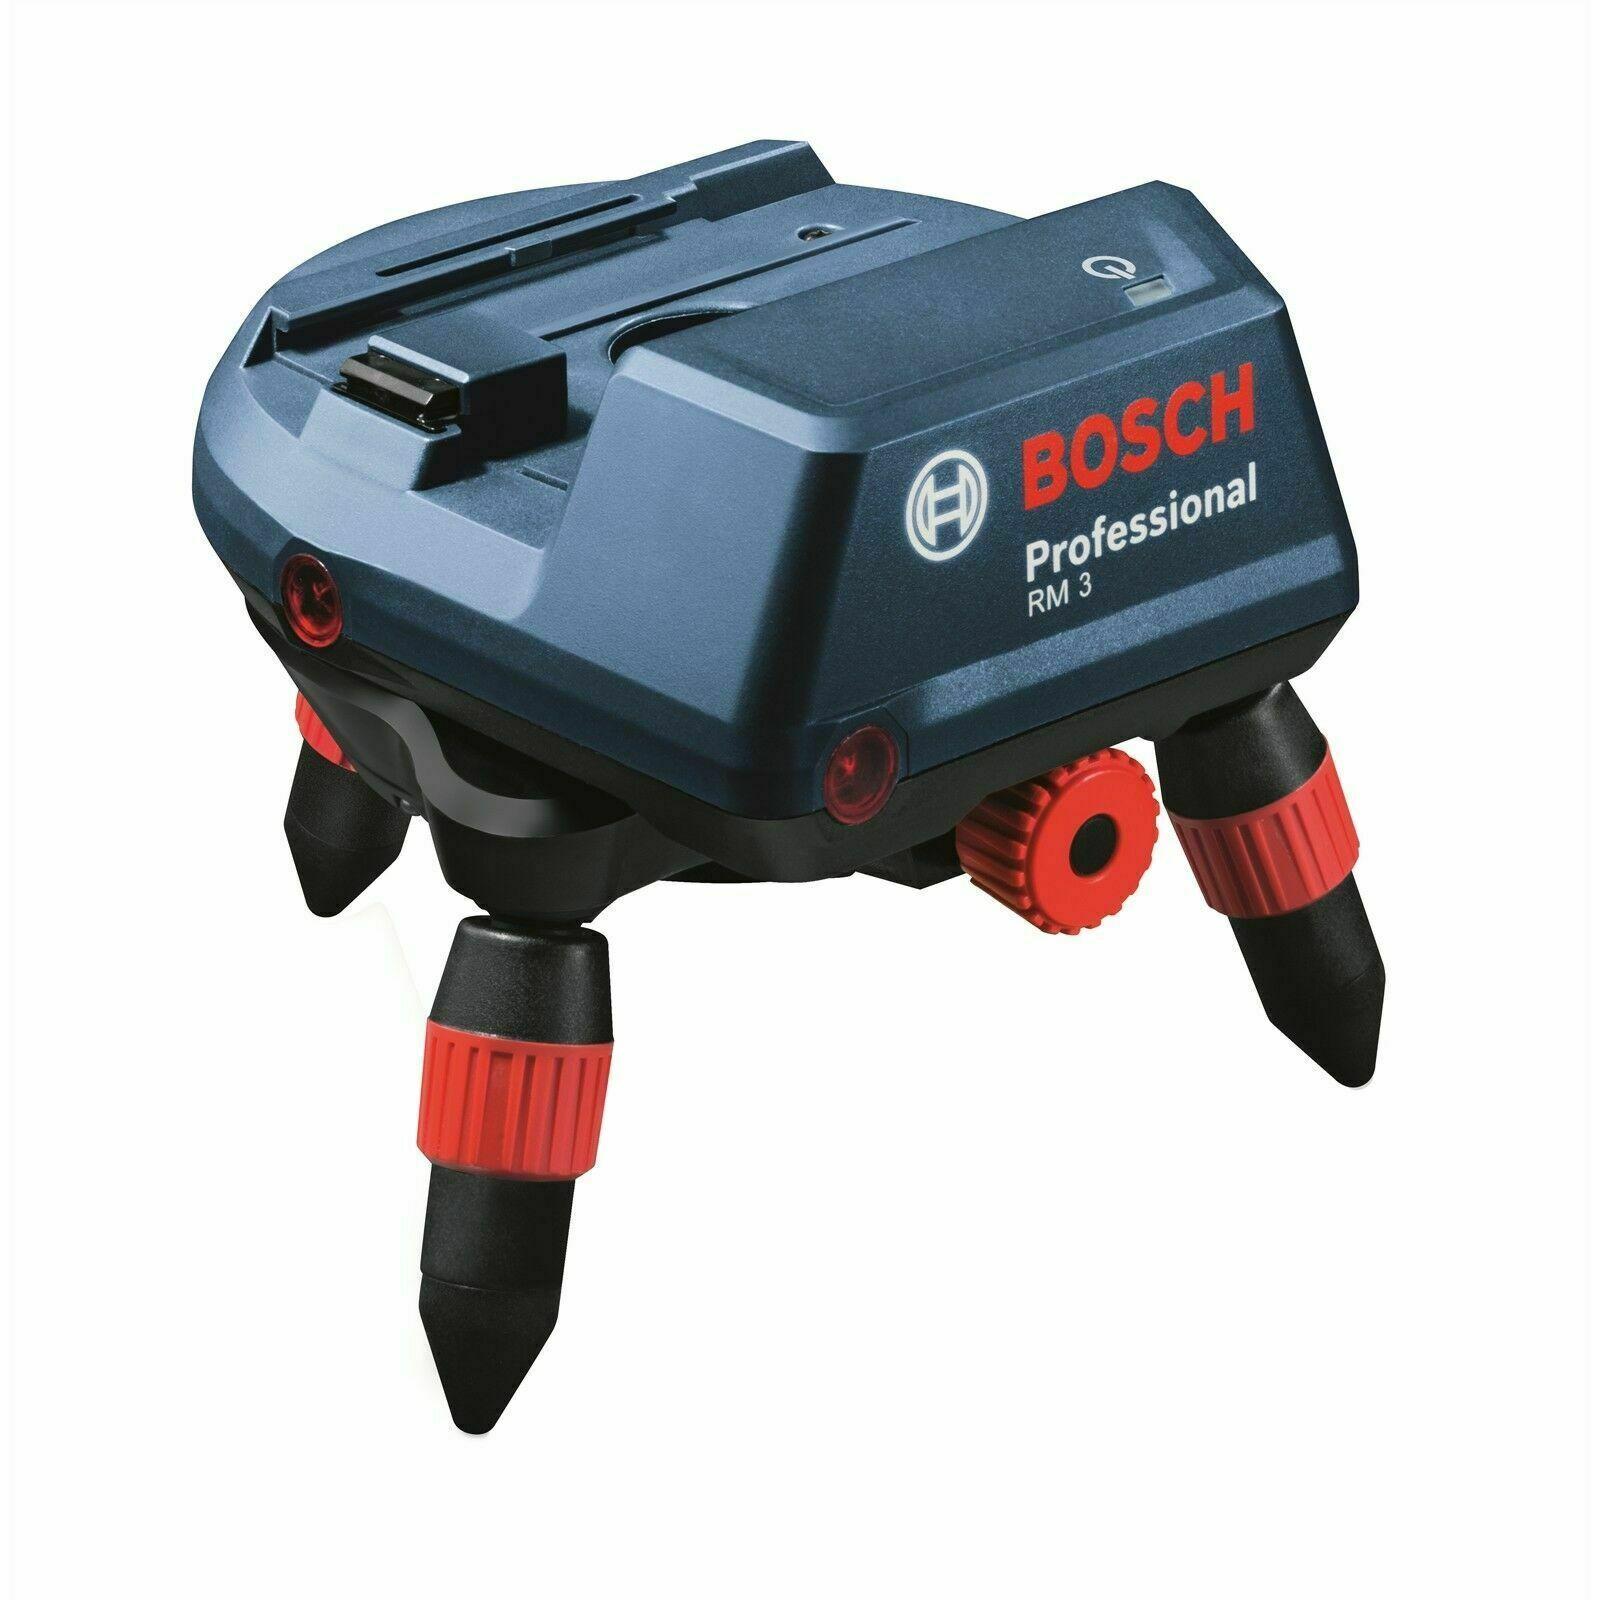 GERMANY BRAND Bosch RM 3 Laser Motorised Base